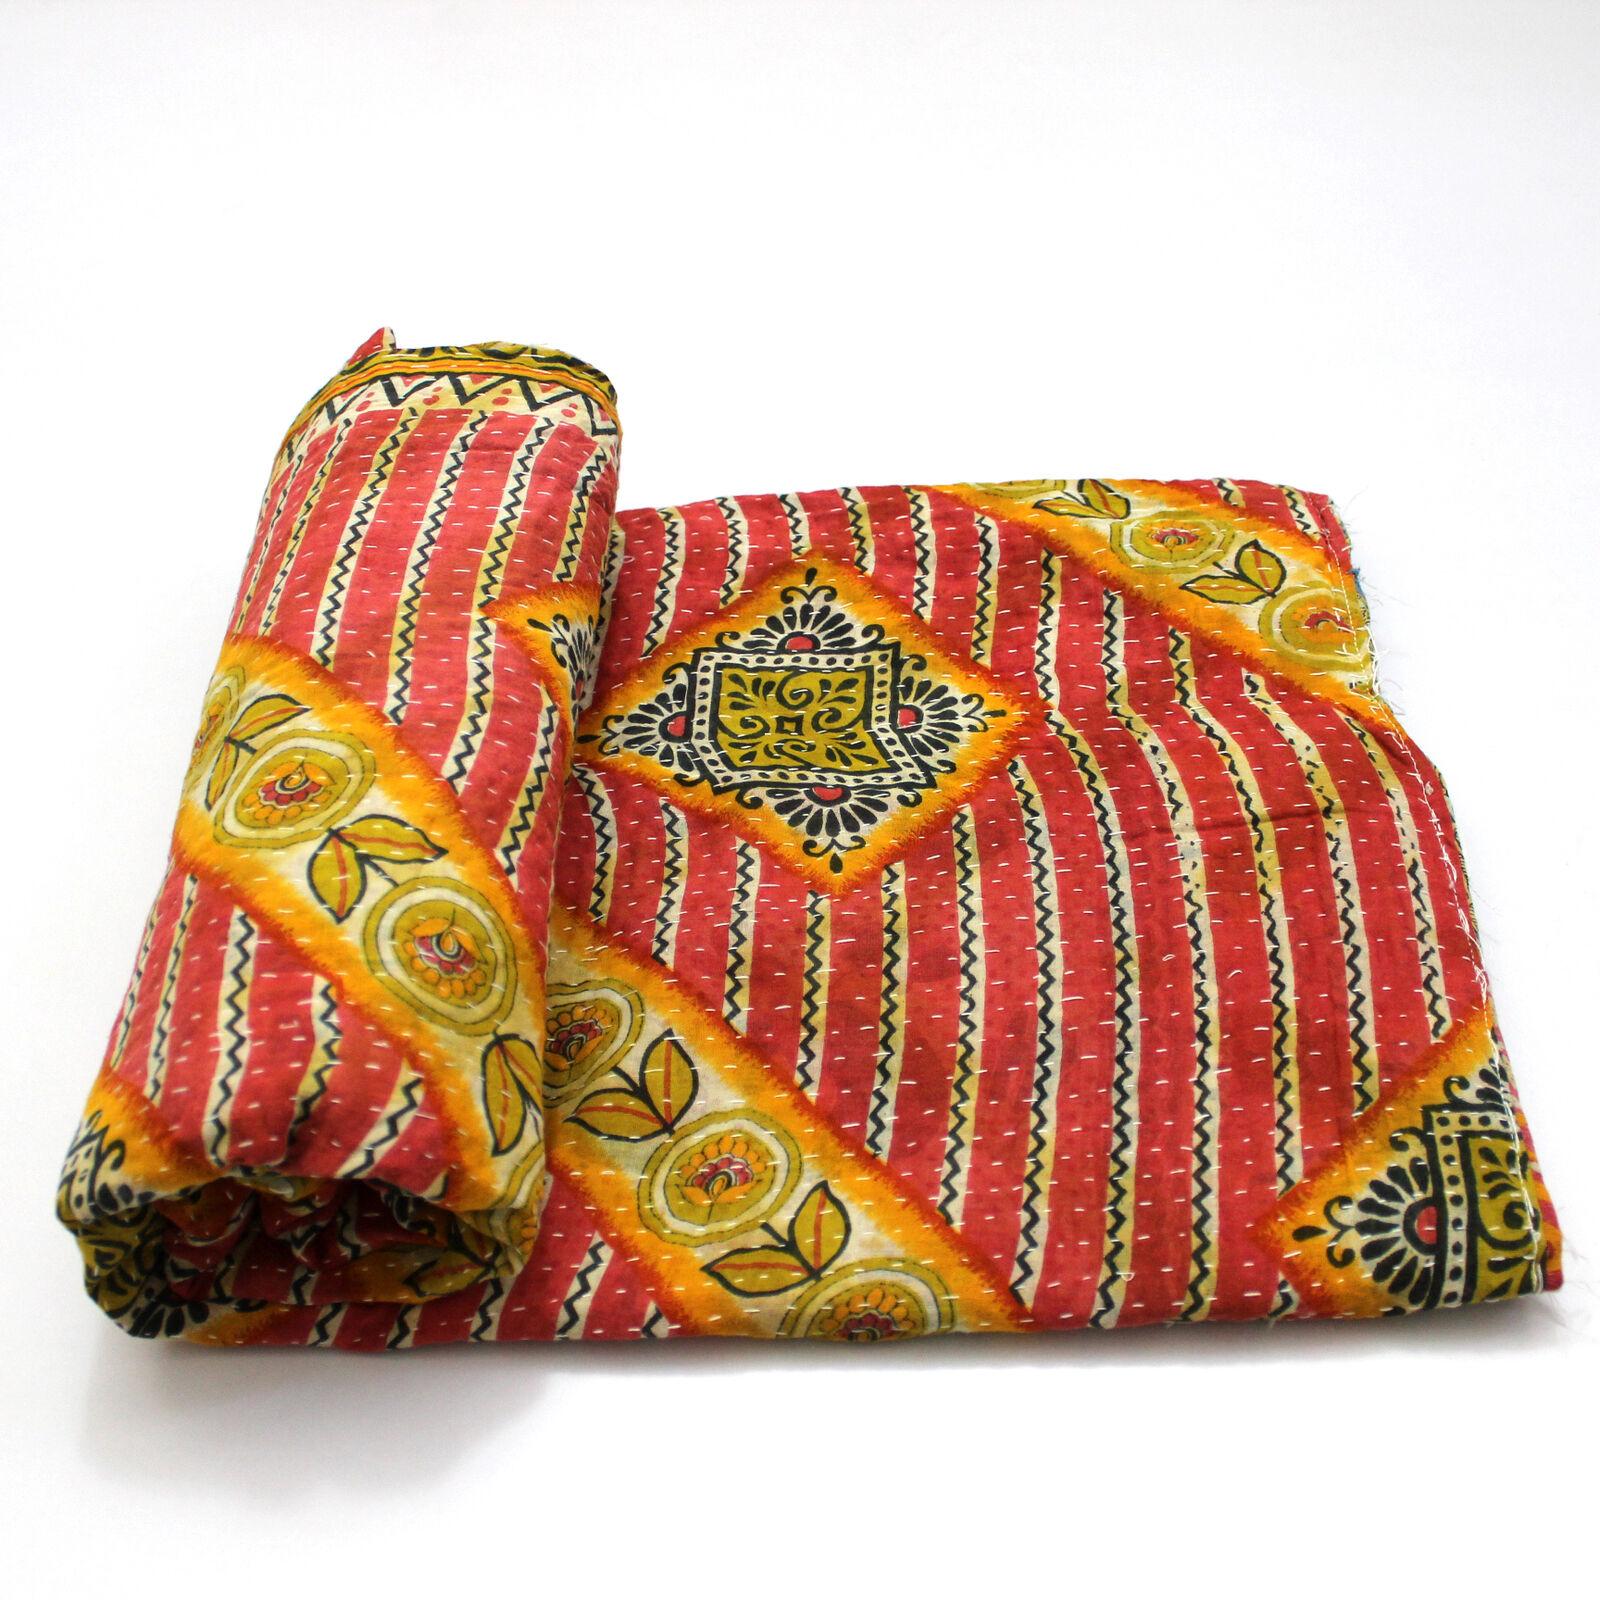 Vintage Quilt Indian Handmade Organic Cotton Bedspread Bohemian Blanket Throw